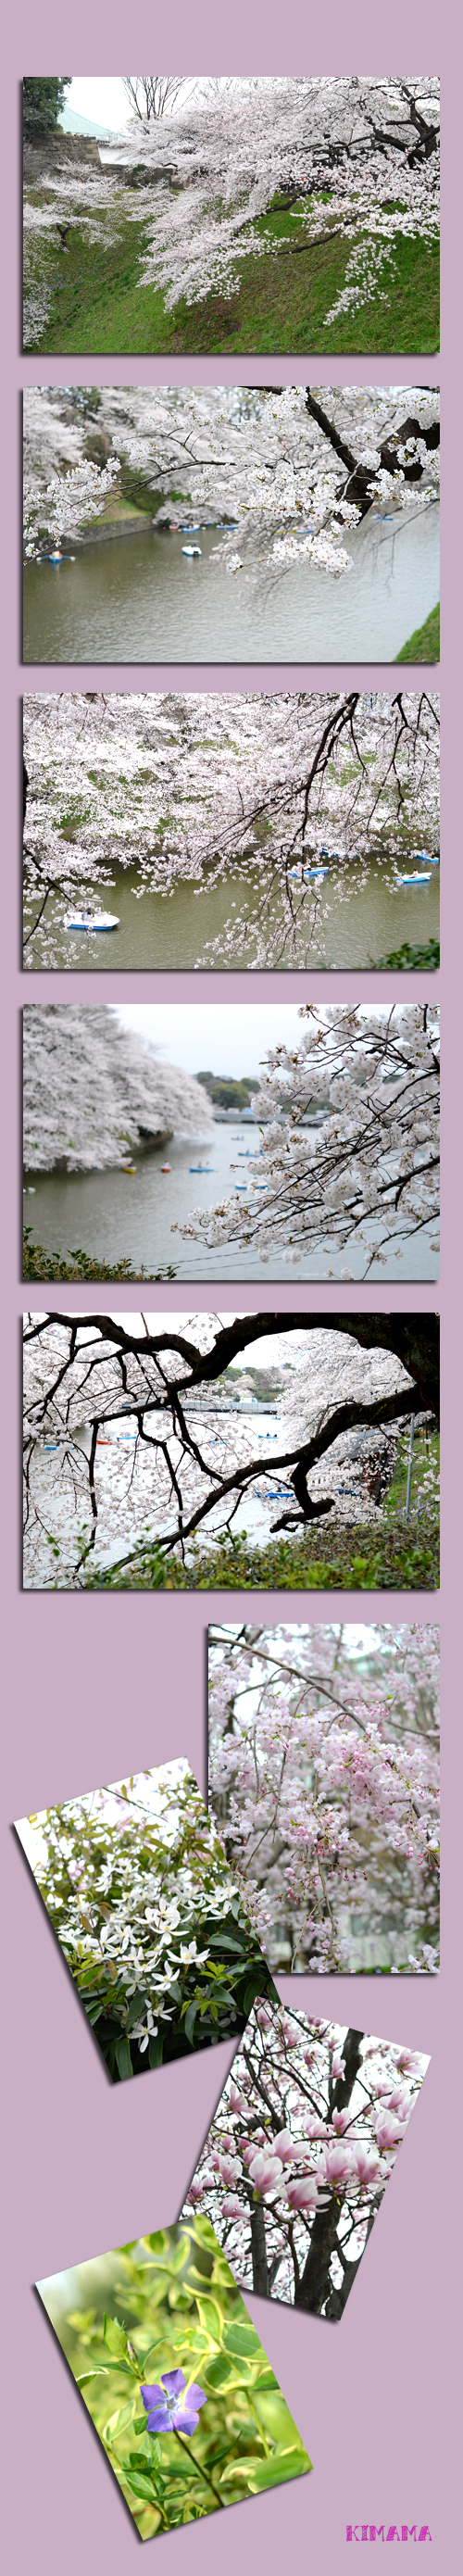 3月23日桜2